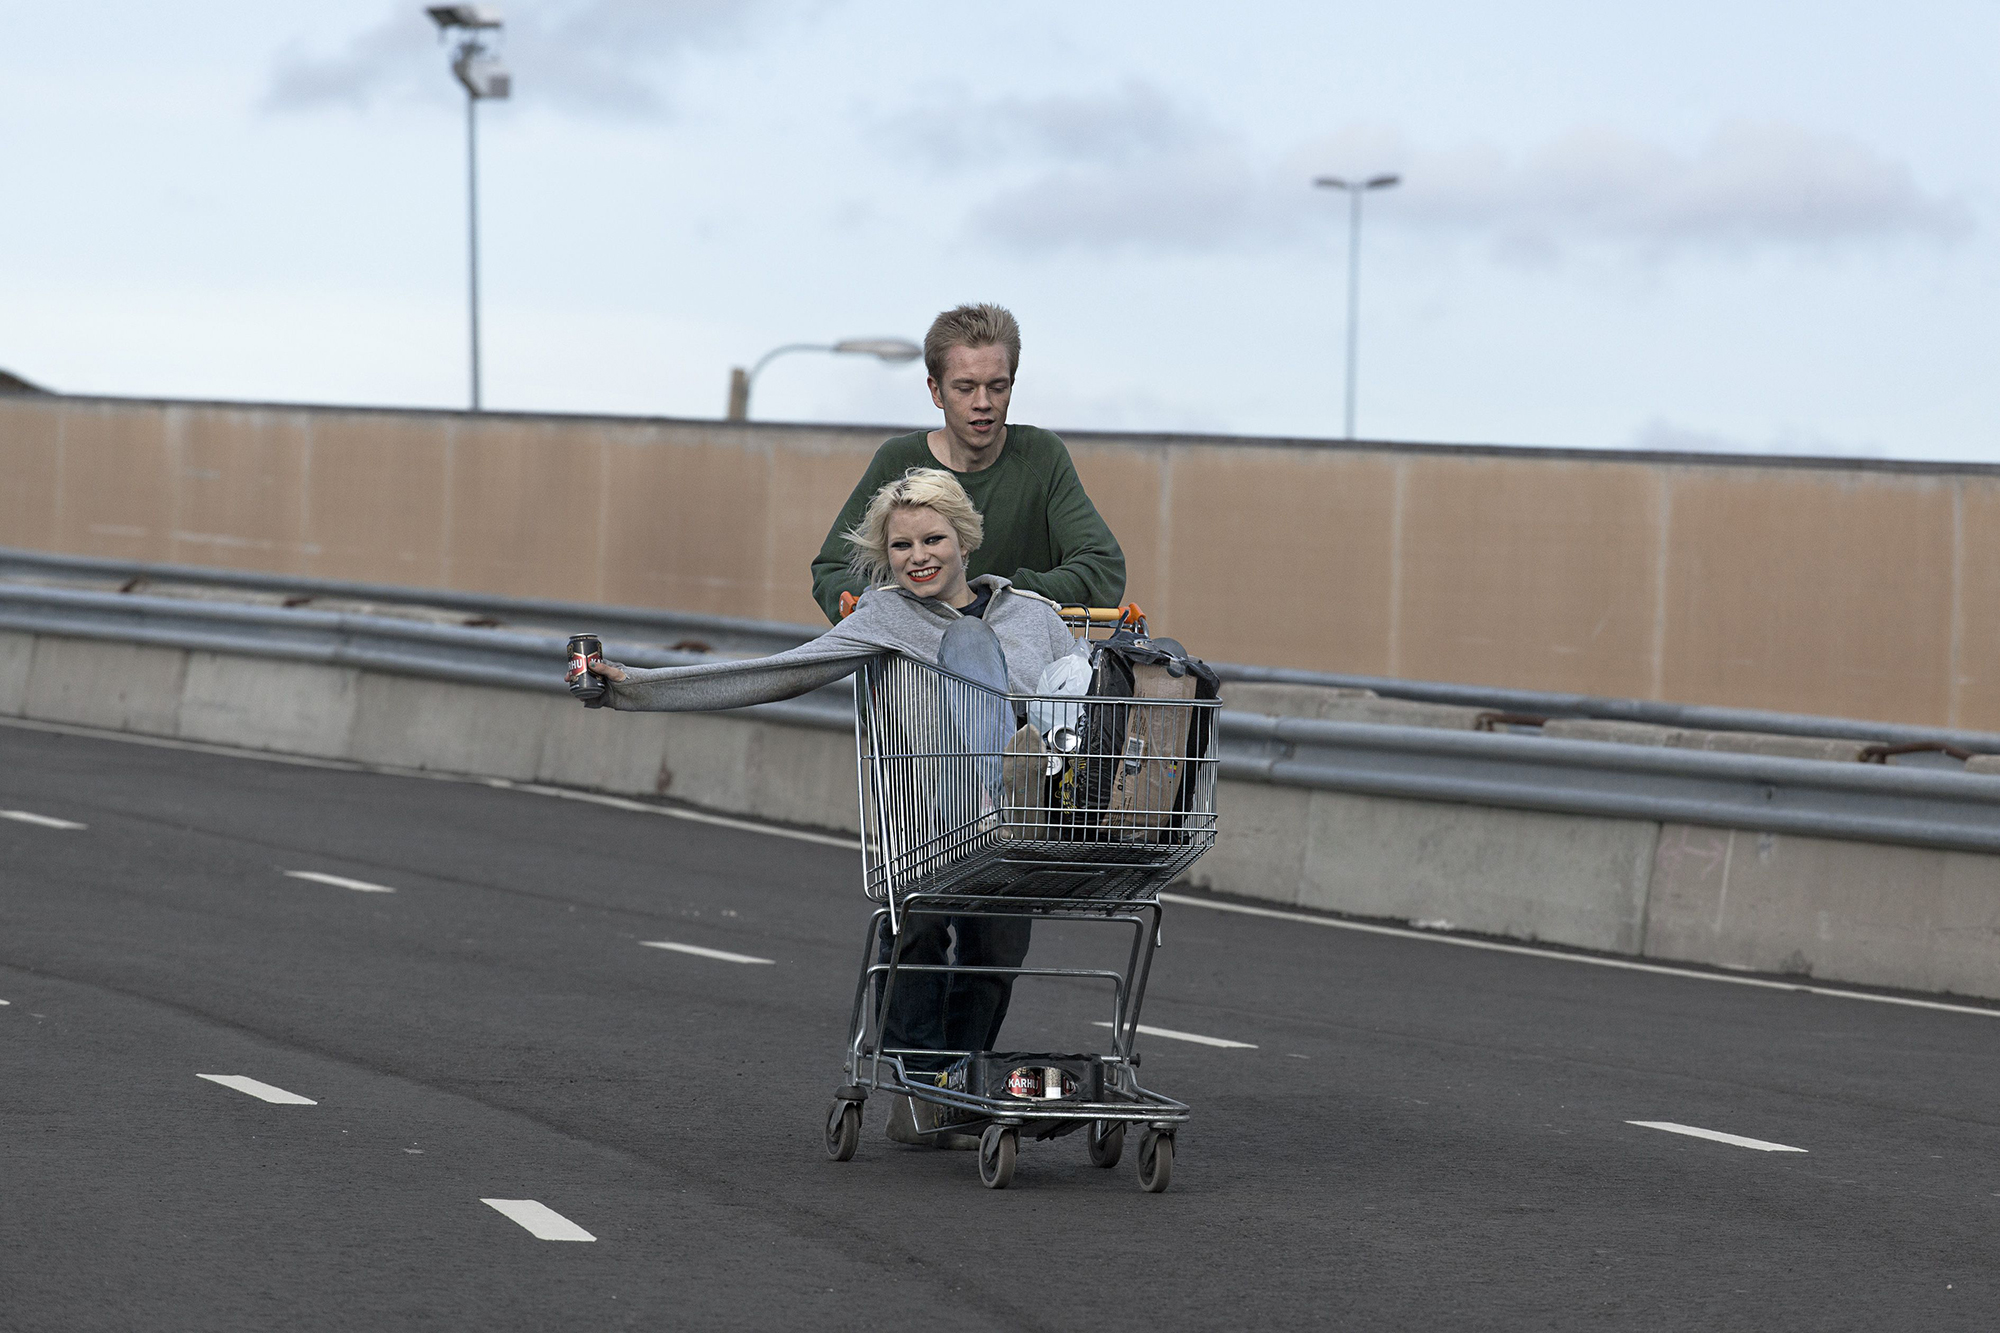 They Have Escaped: Roosa Söderholm e Teppo Manner in una scena del film